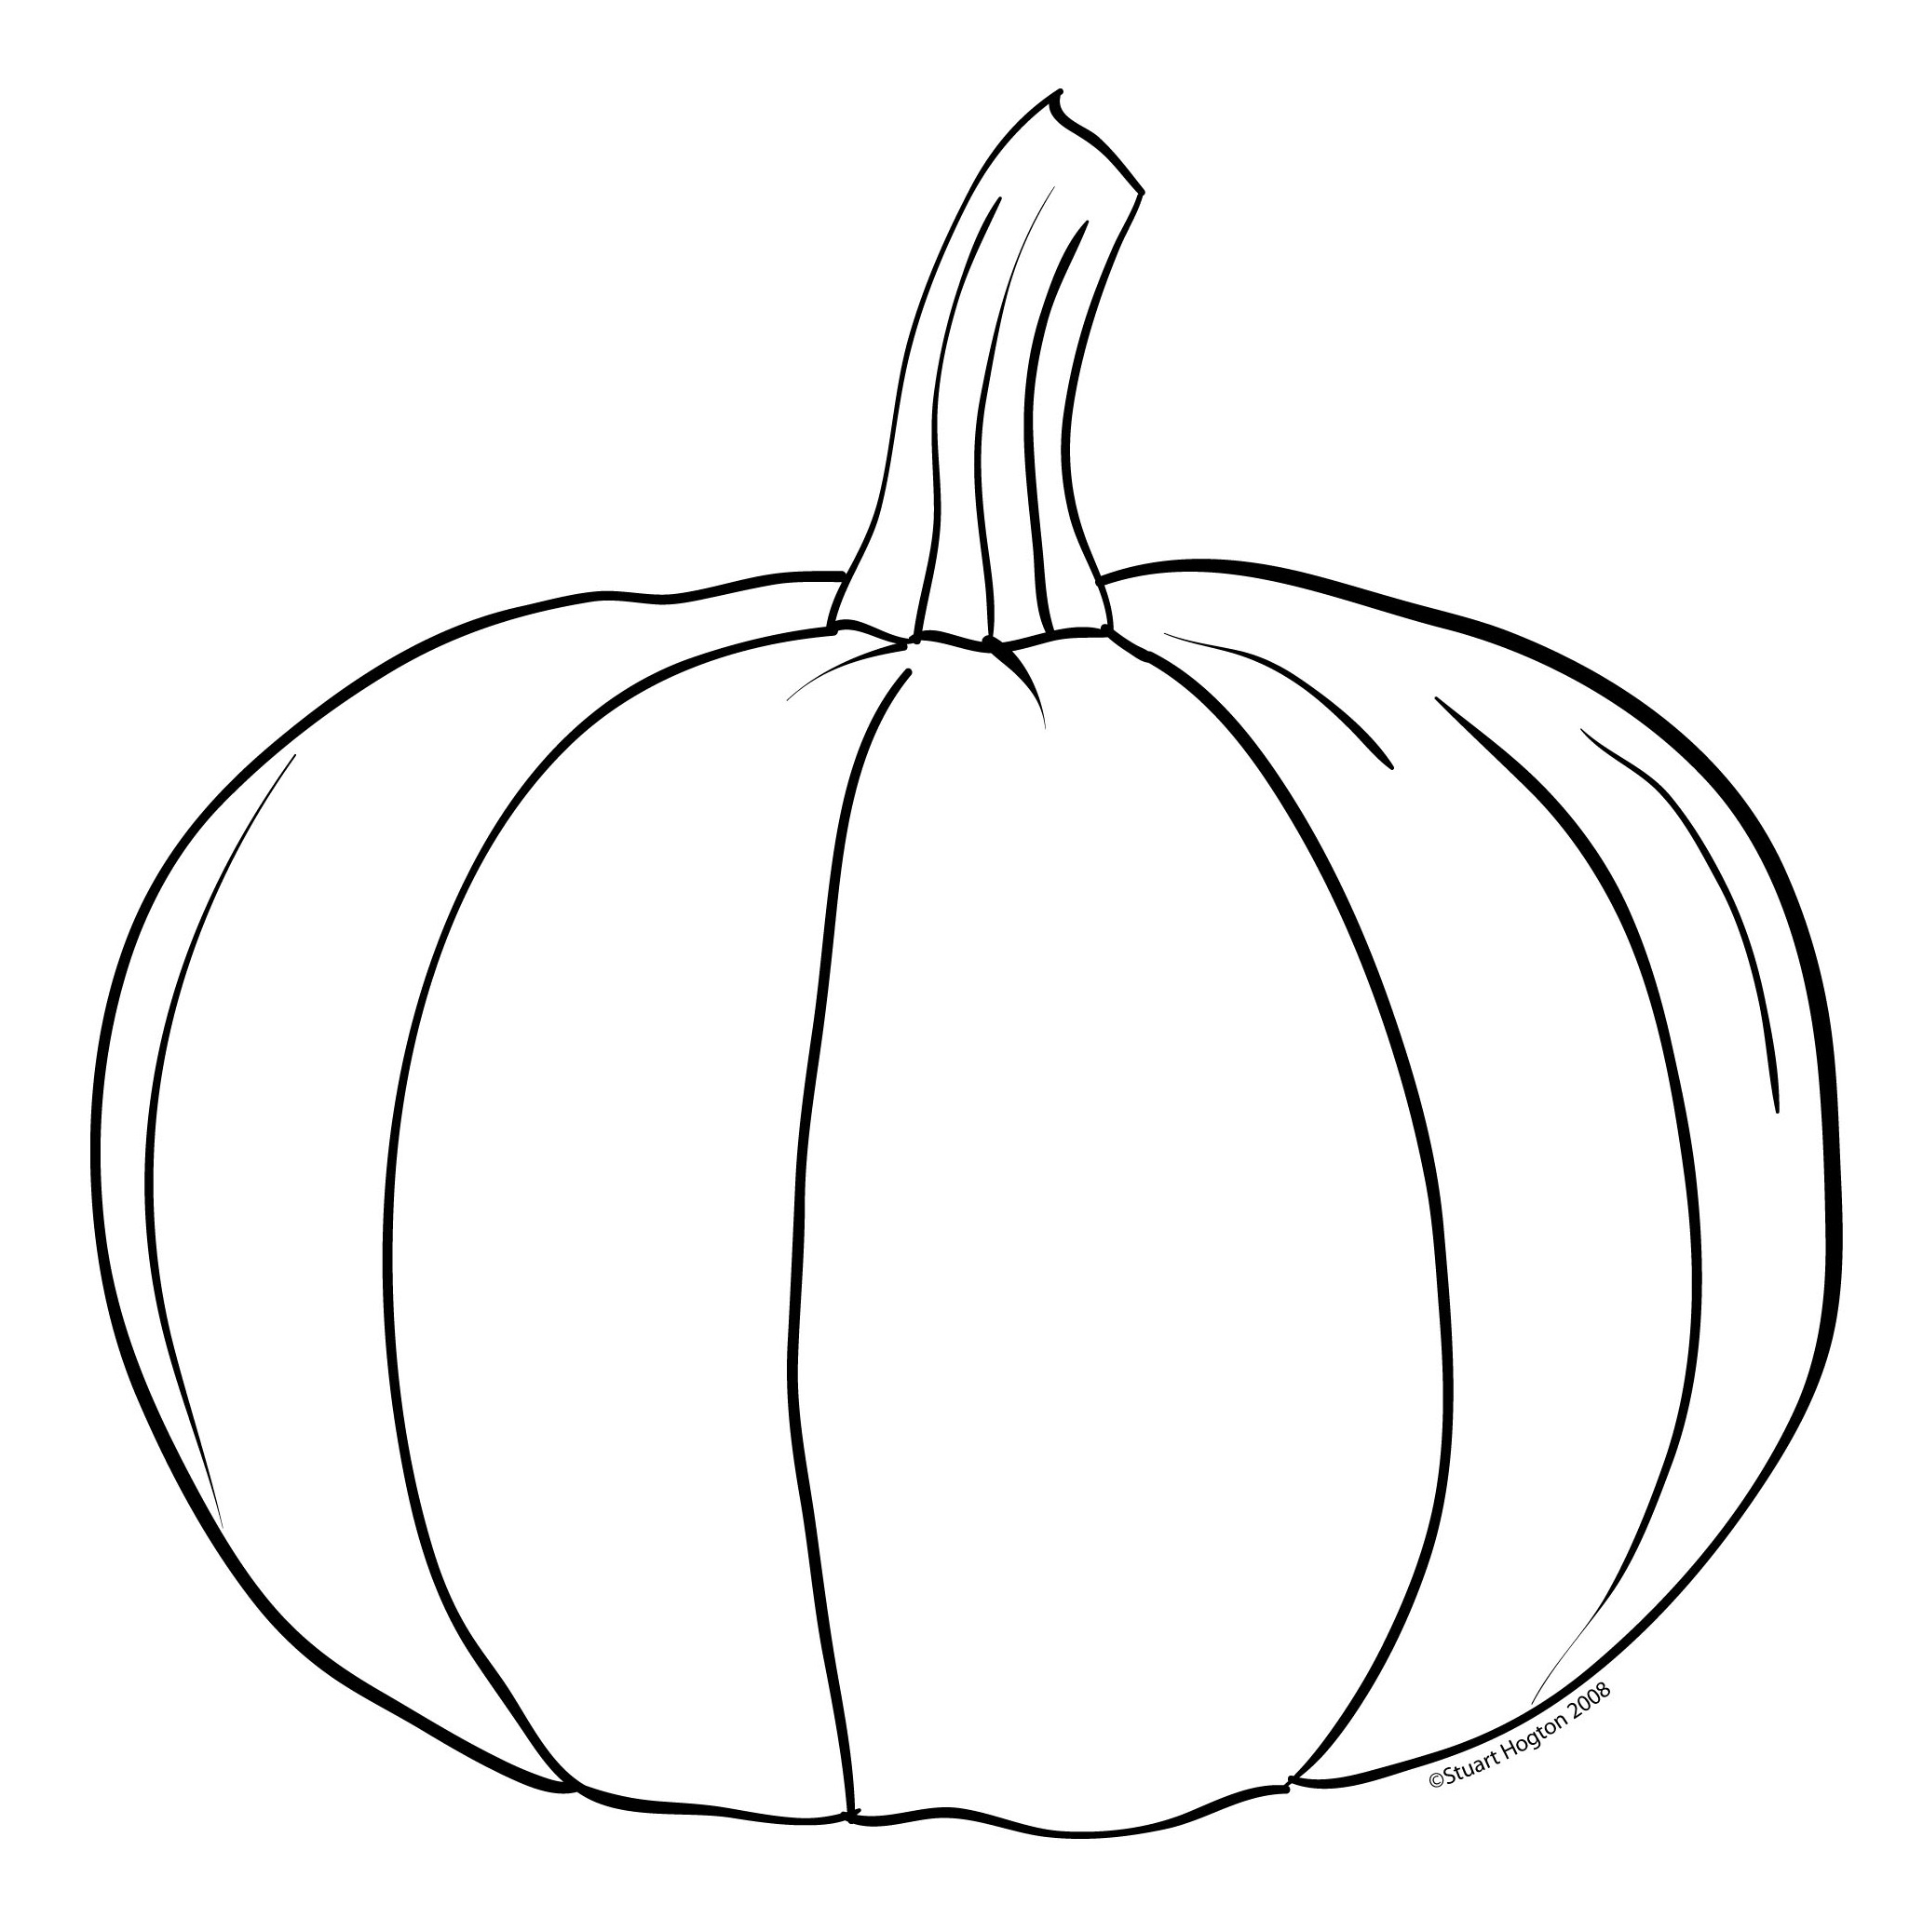 Pumpkin Coloring Template Coloring Pages-Pumpkin Coloring Template Coloring Pages For Adults Coloring Pumpkin-11